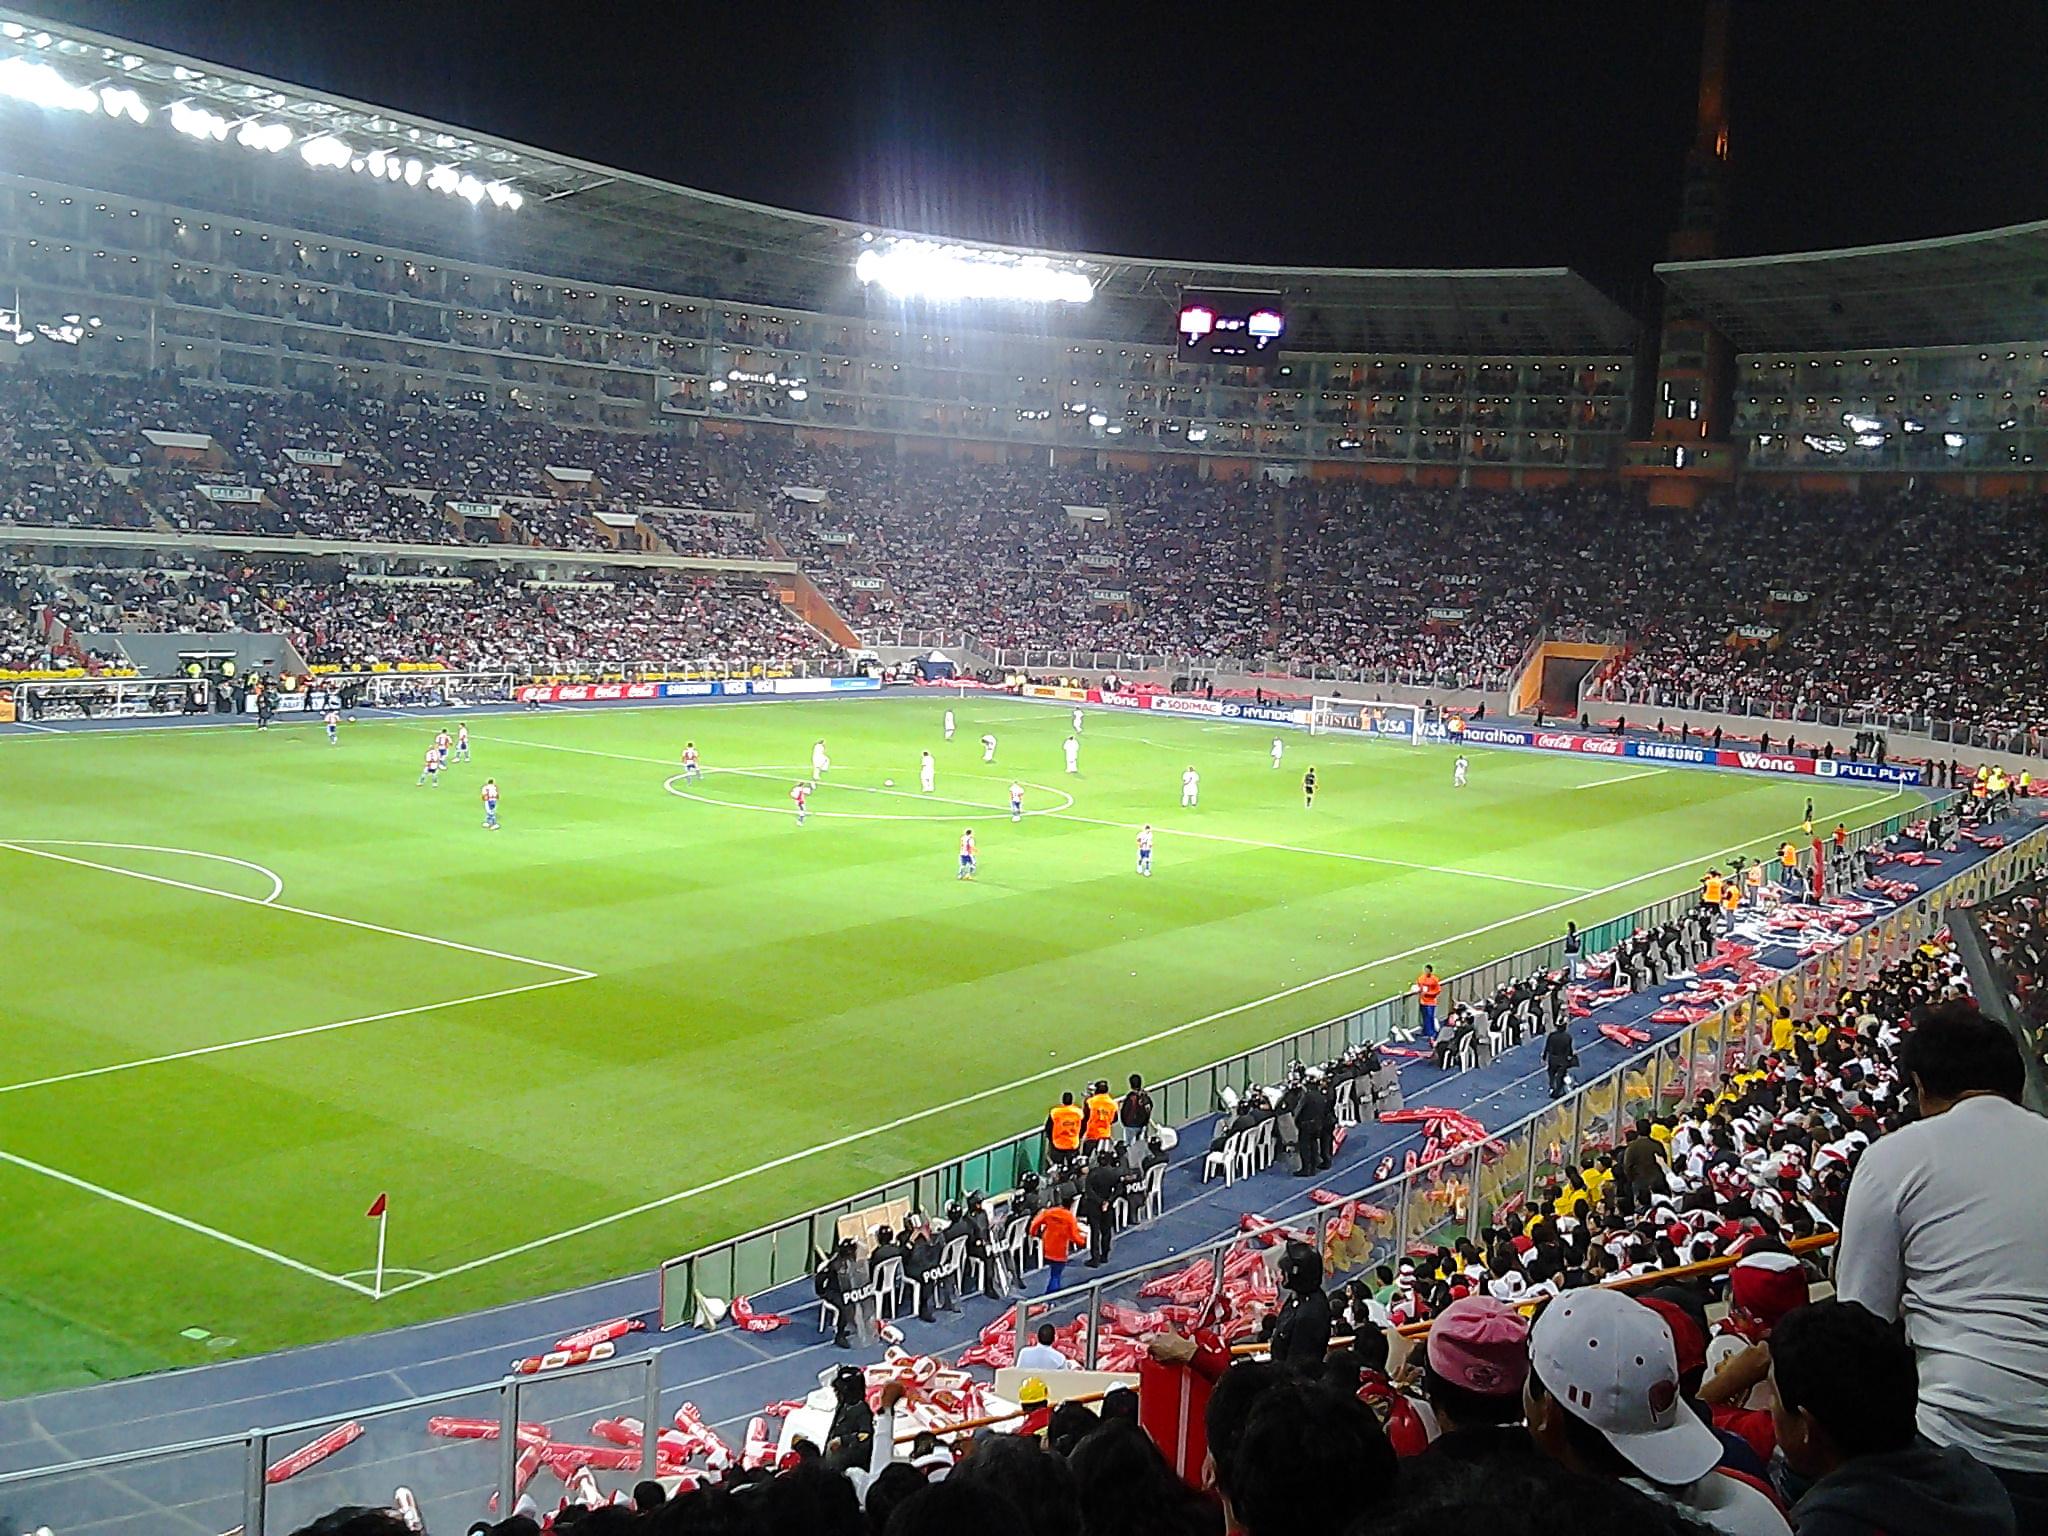 Estadio nacional de lima wikiwand for Puerta 9 del estadio nacional de lima